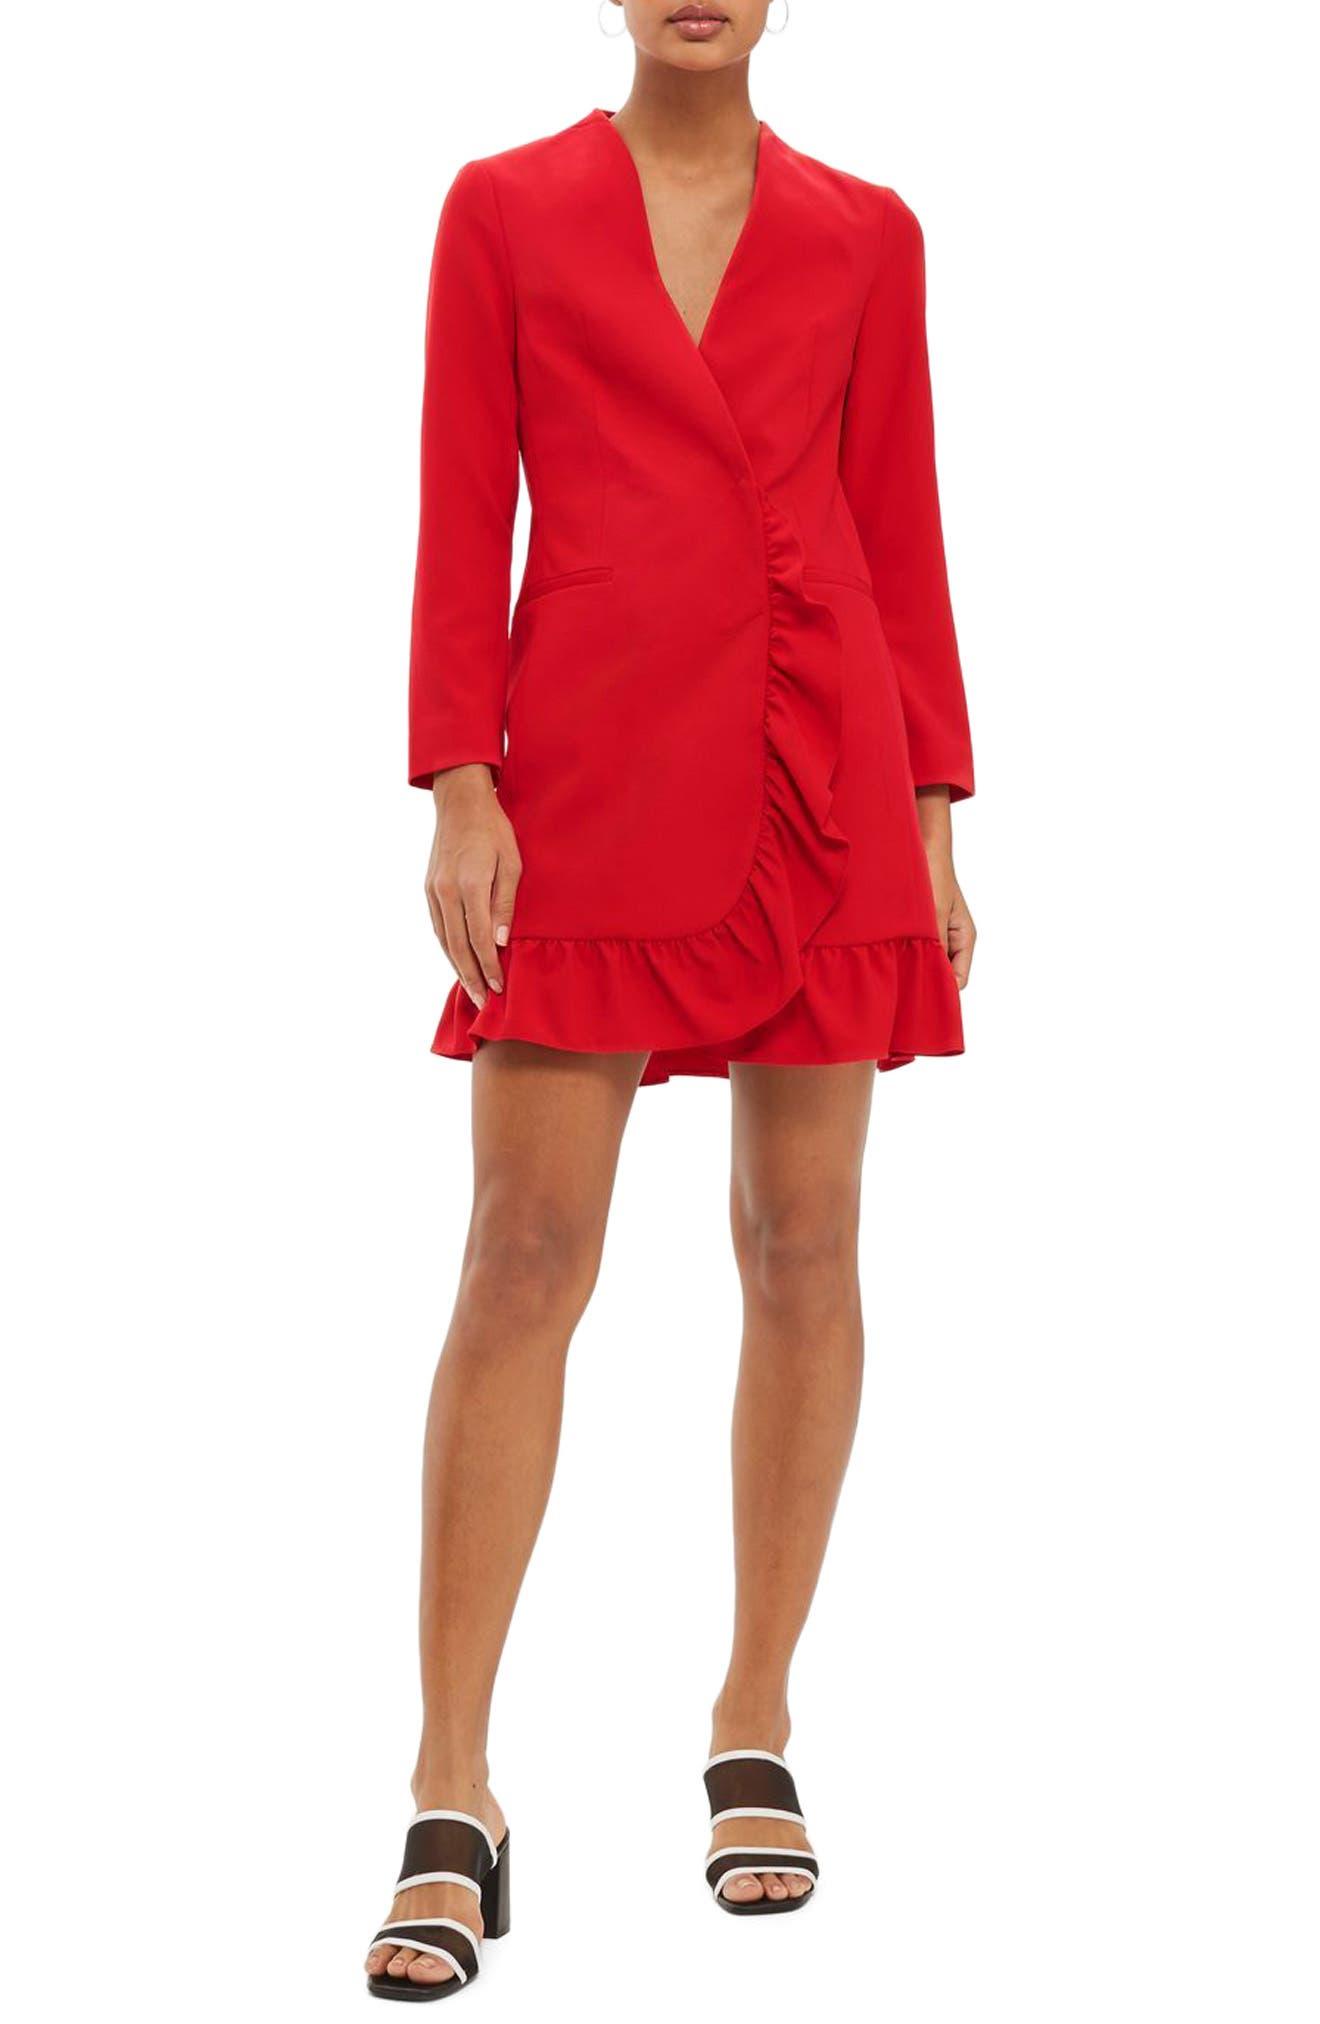 Topshop Ruffle Blazer Dress